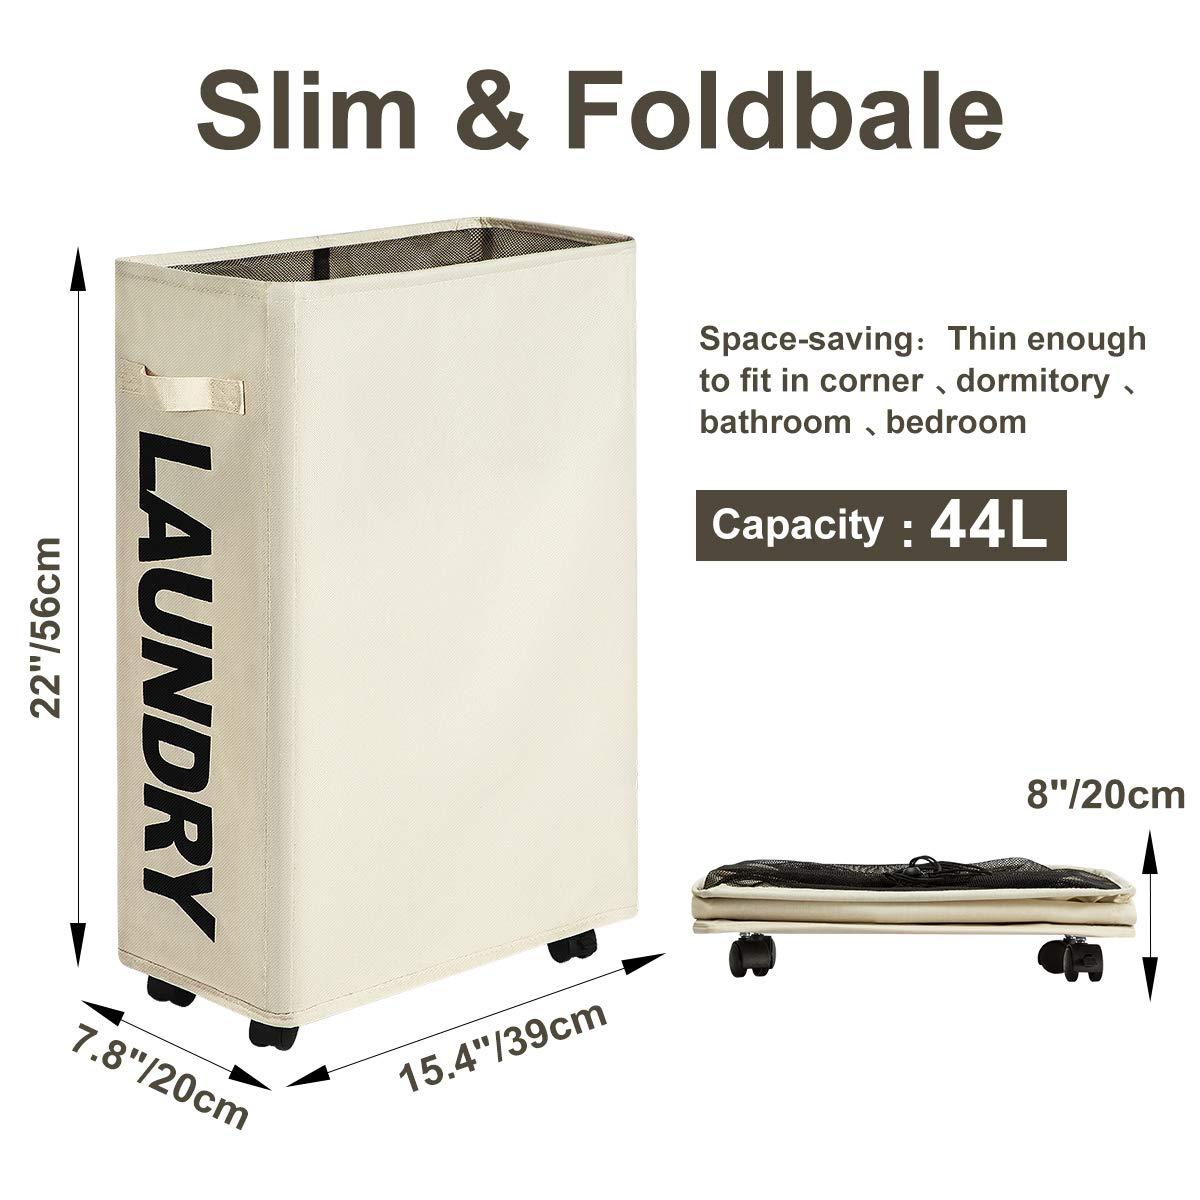 WOWLIVE Slim Laundry Basket Hamper on Wheels Collapsible Rolling Foldable Laundry Bin 44L(Beige)